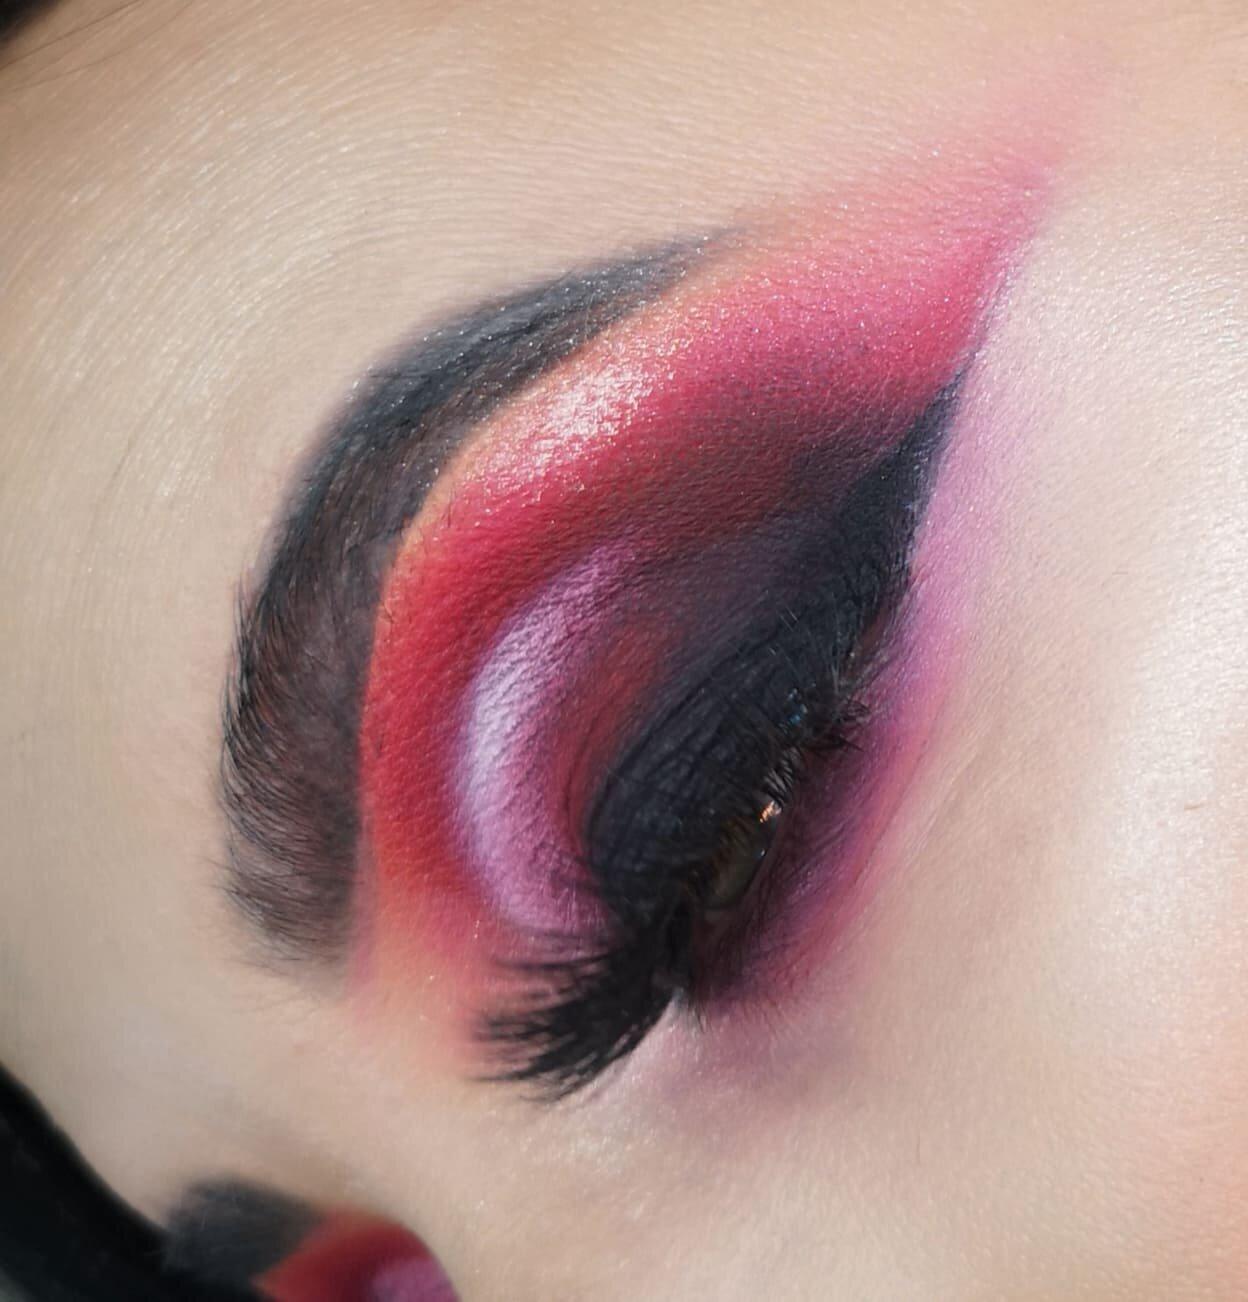 ITEC Award in Photographic Makeup Ireland